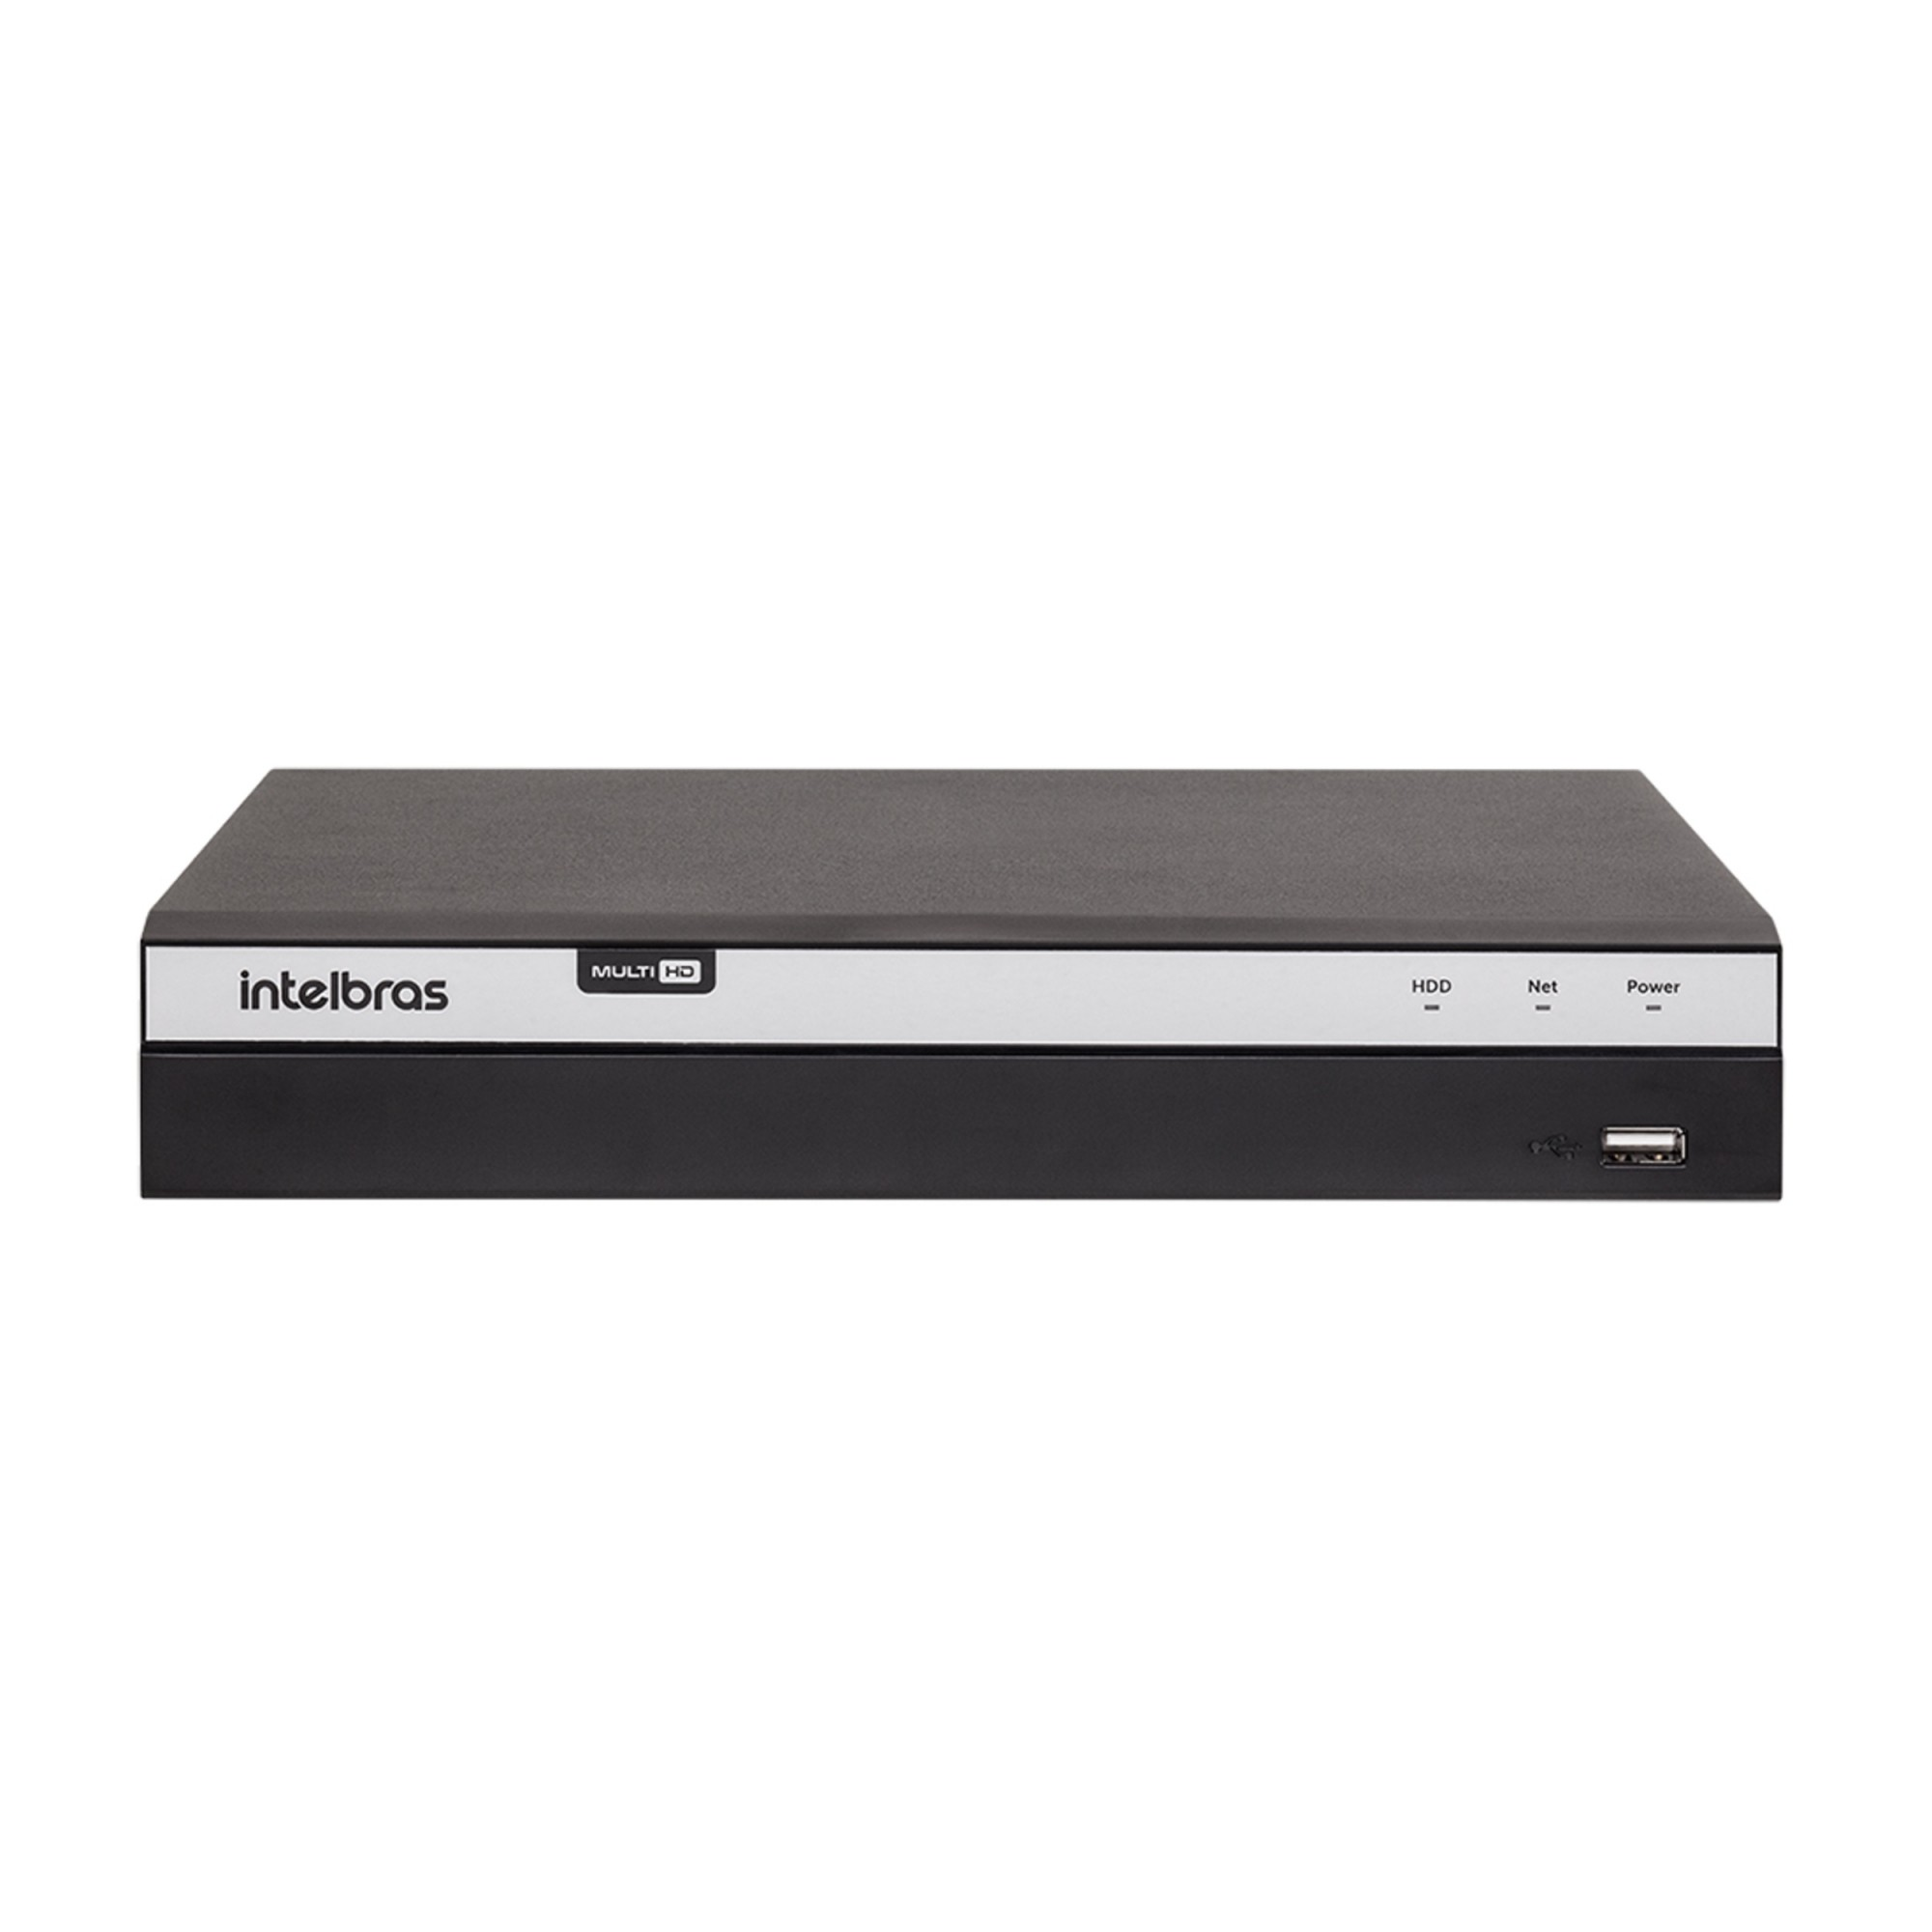 DVR Intelbras 16 canais MHDX 3116 4MP Lite Mult HD 4580332